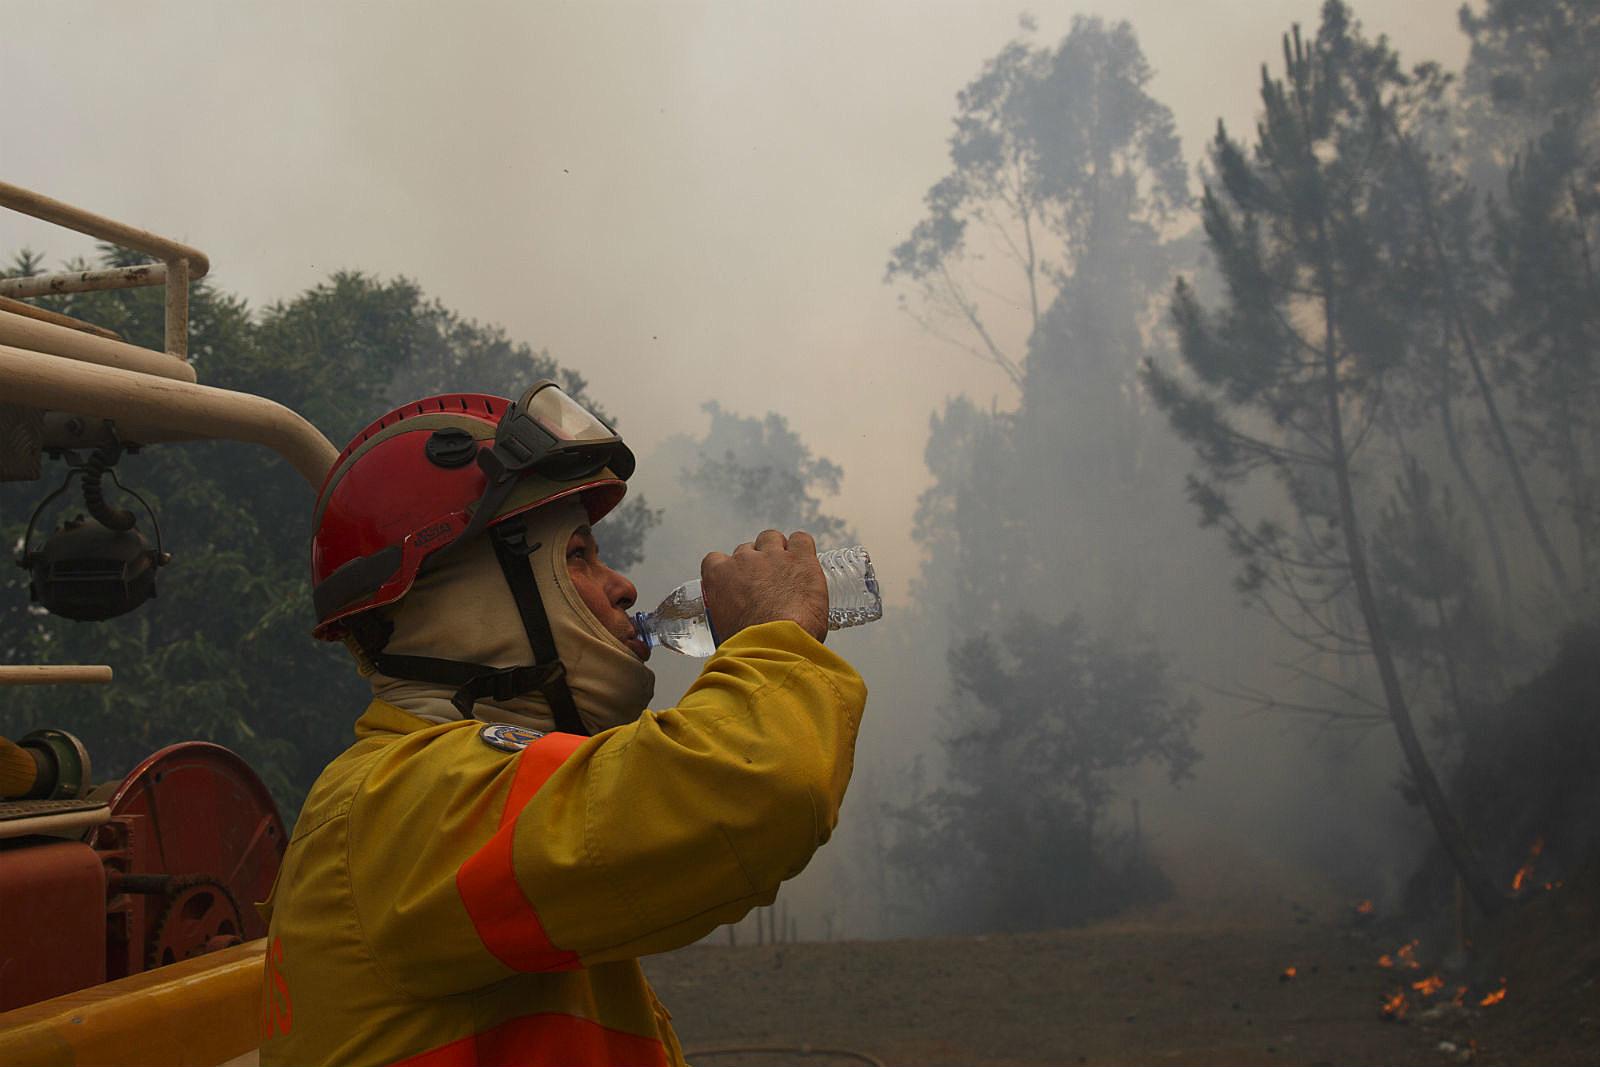 Fire Fighter Water_ Pablo Blazquez Dominguez/Getty